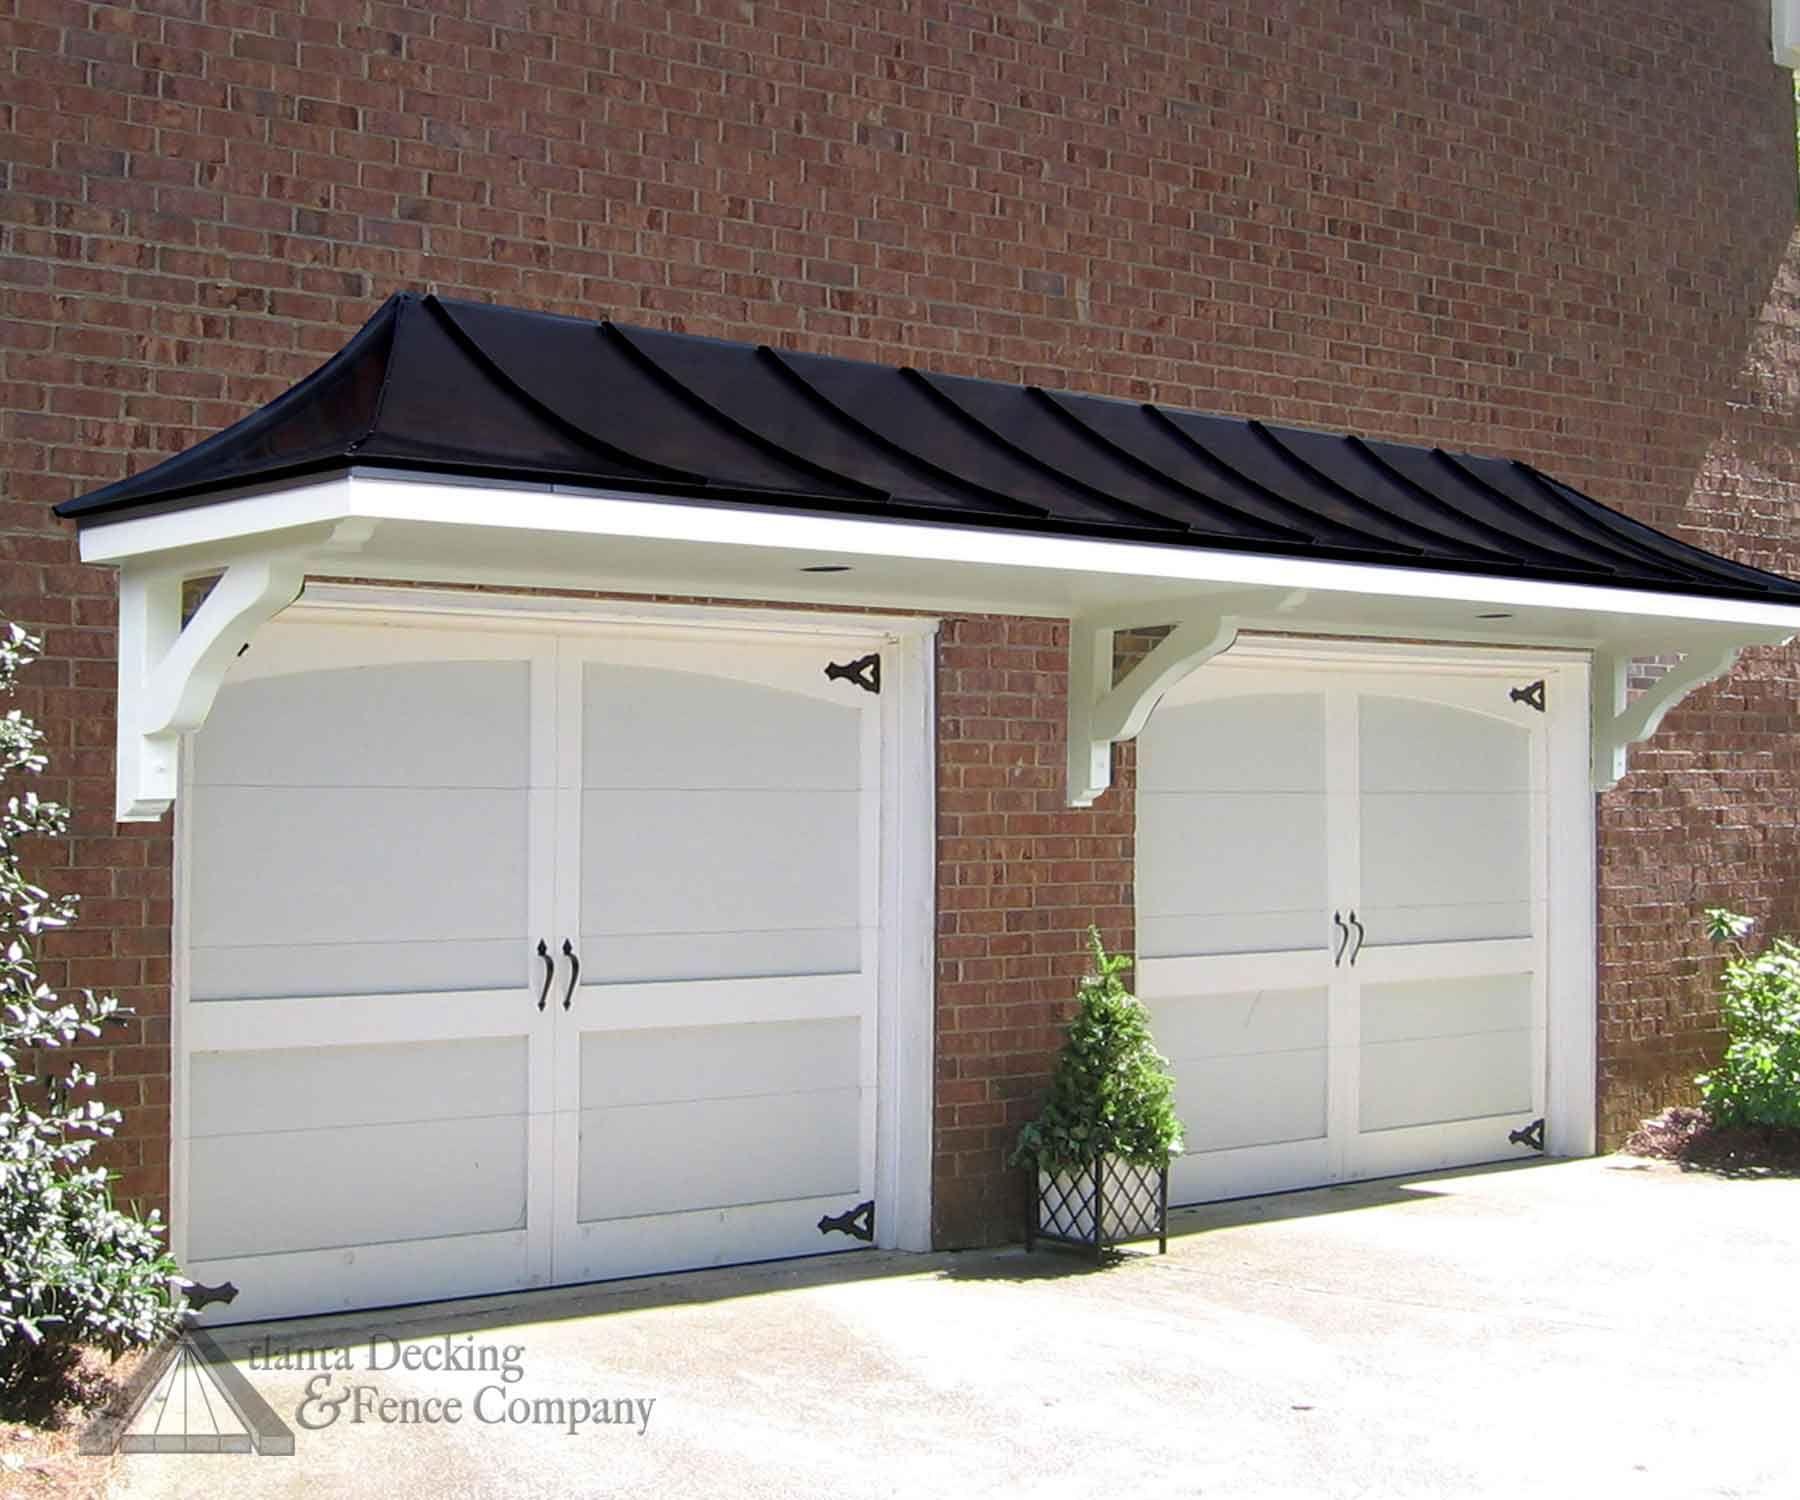 Hip roof pergola over garage doors from atlanta decking ...